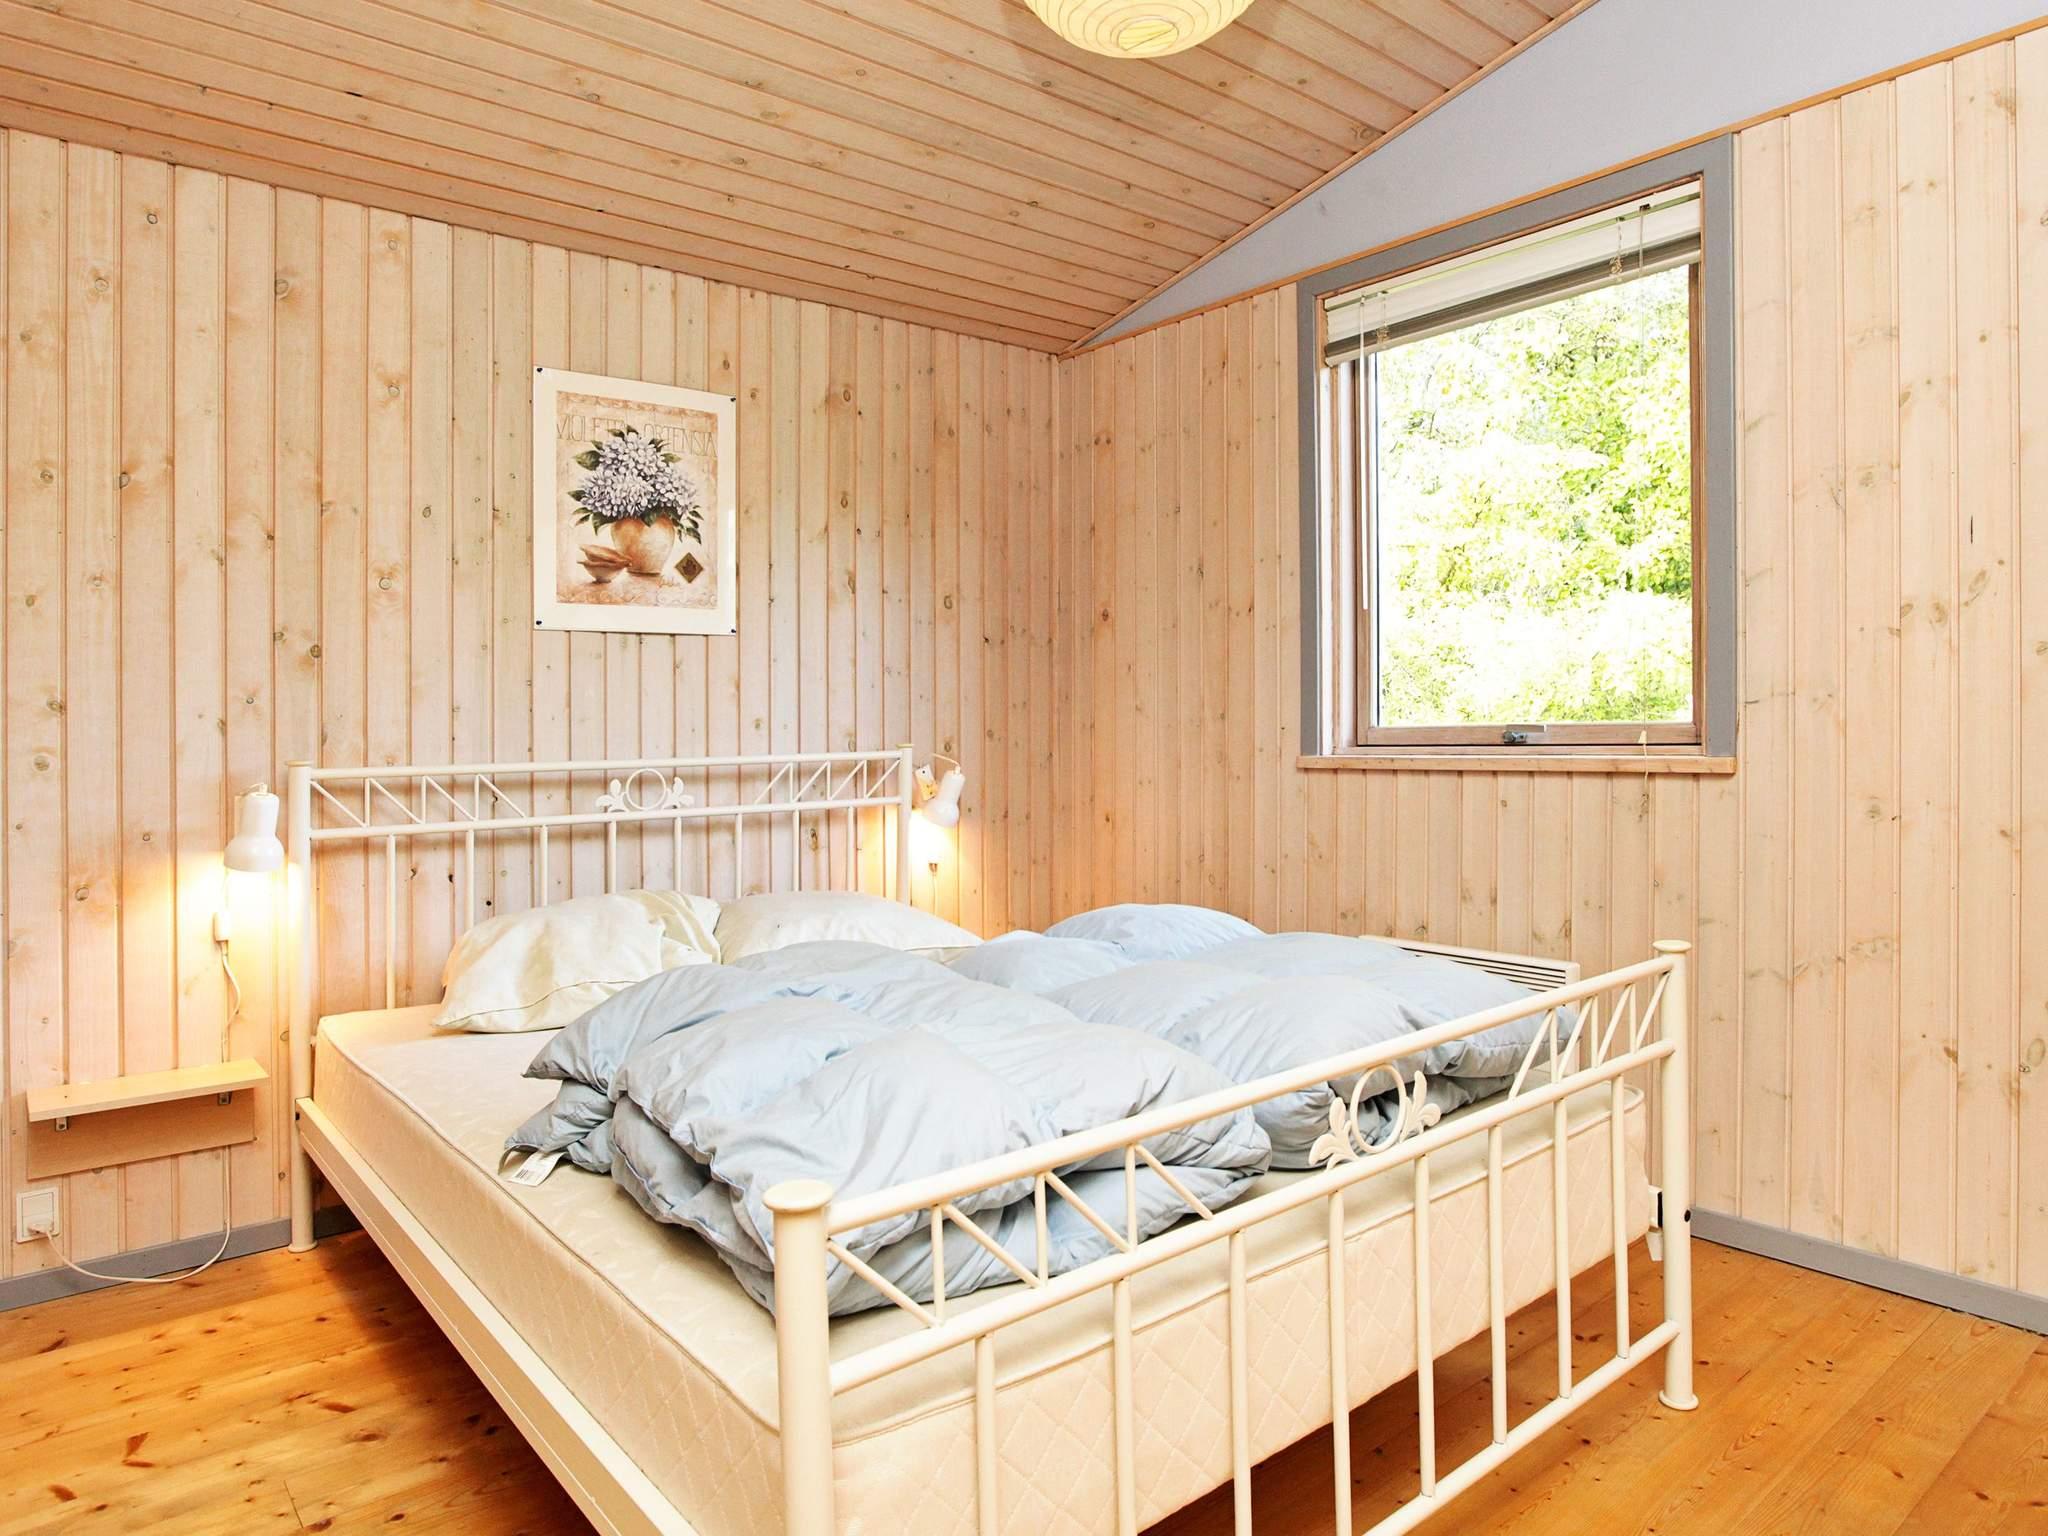 Ferienhaus Overby Lyng (93506), Nykøbing Sj, , Westseeland, Dänemark, Bild 18